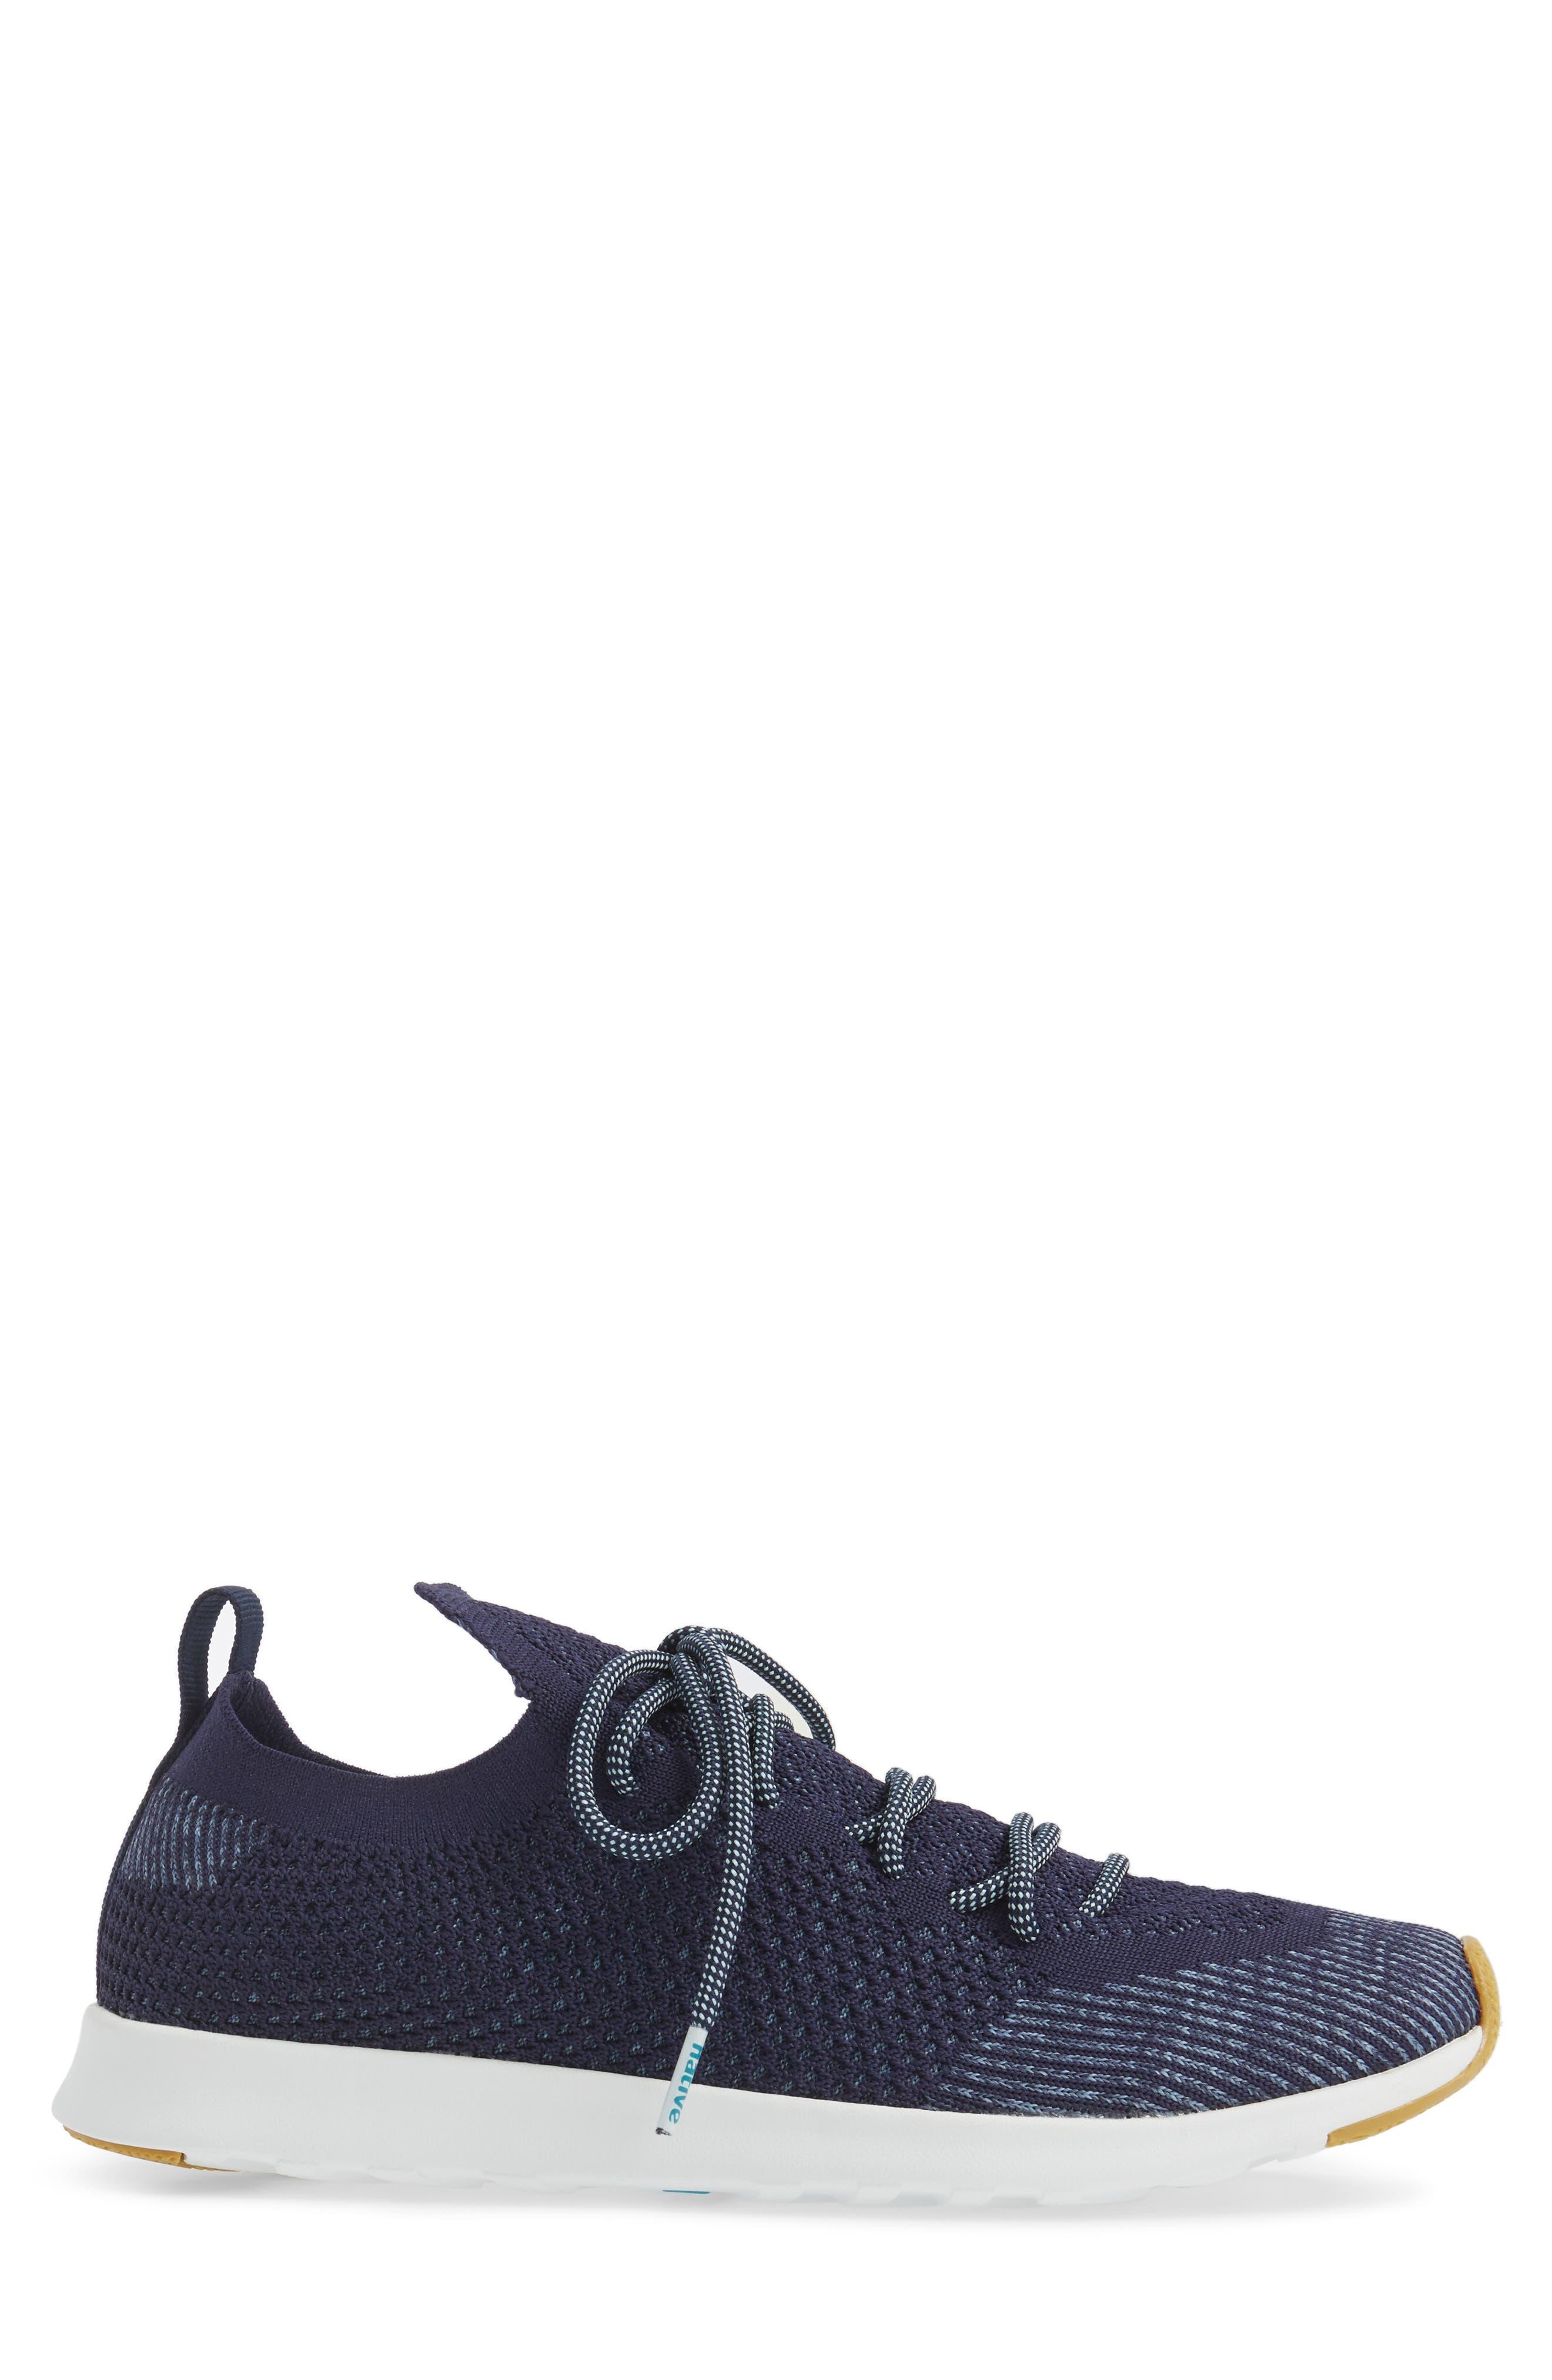 Alternate Image 3  - Native Shoes AP Mercury Liteknit™ Sneaker